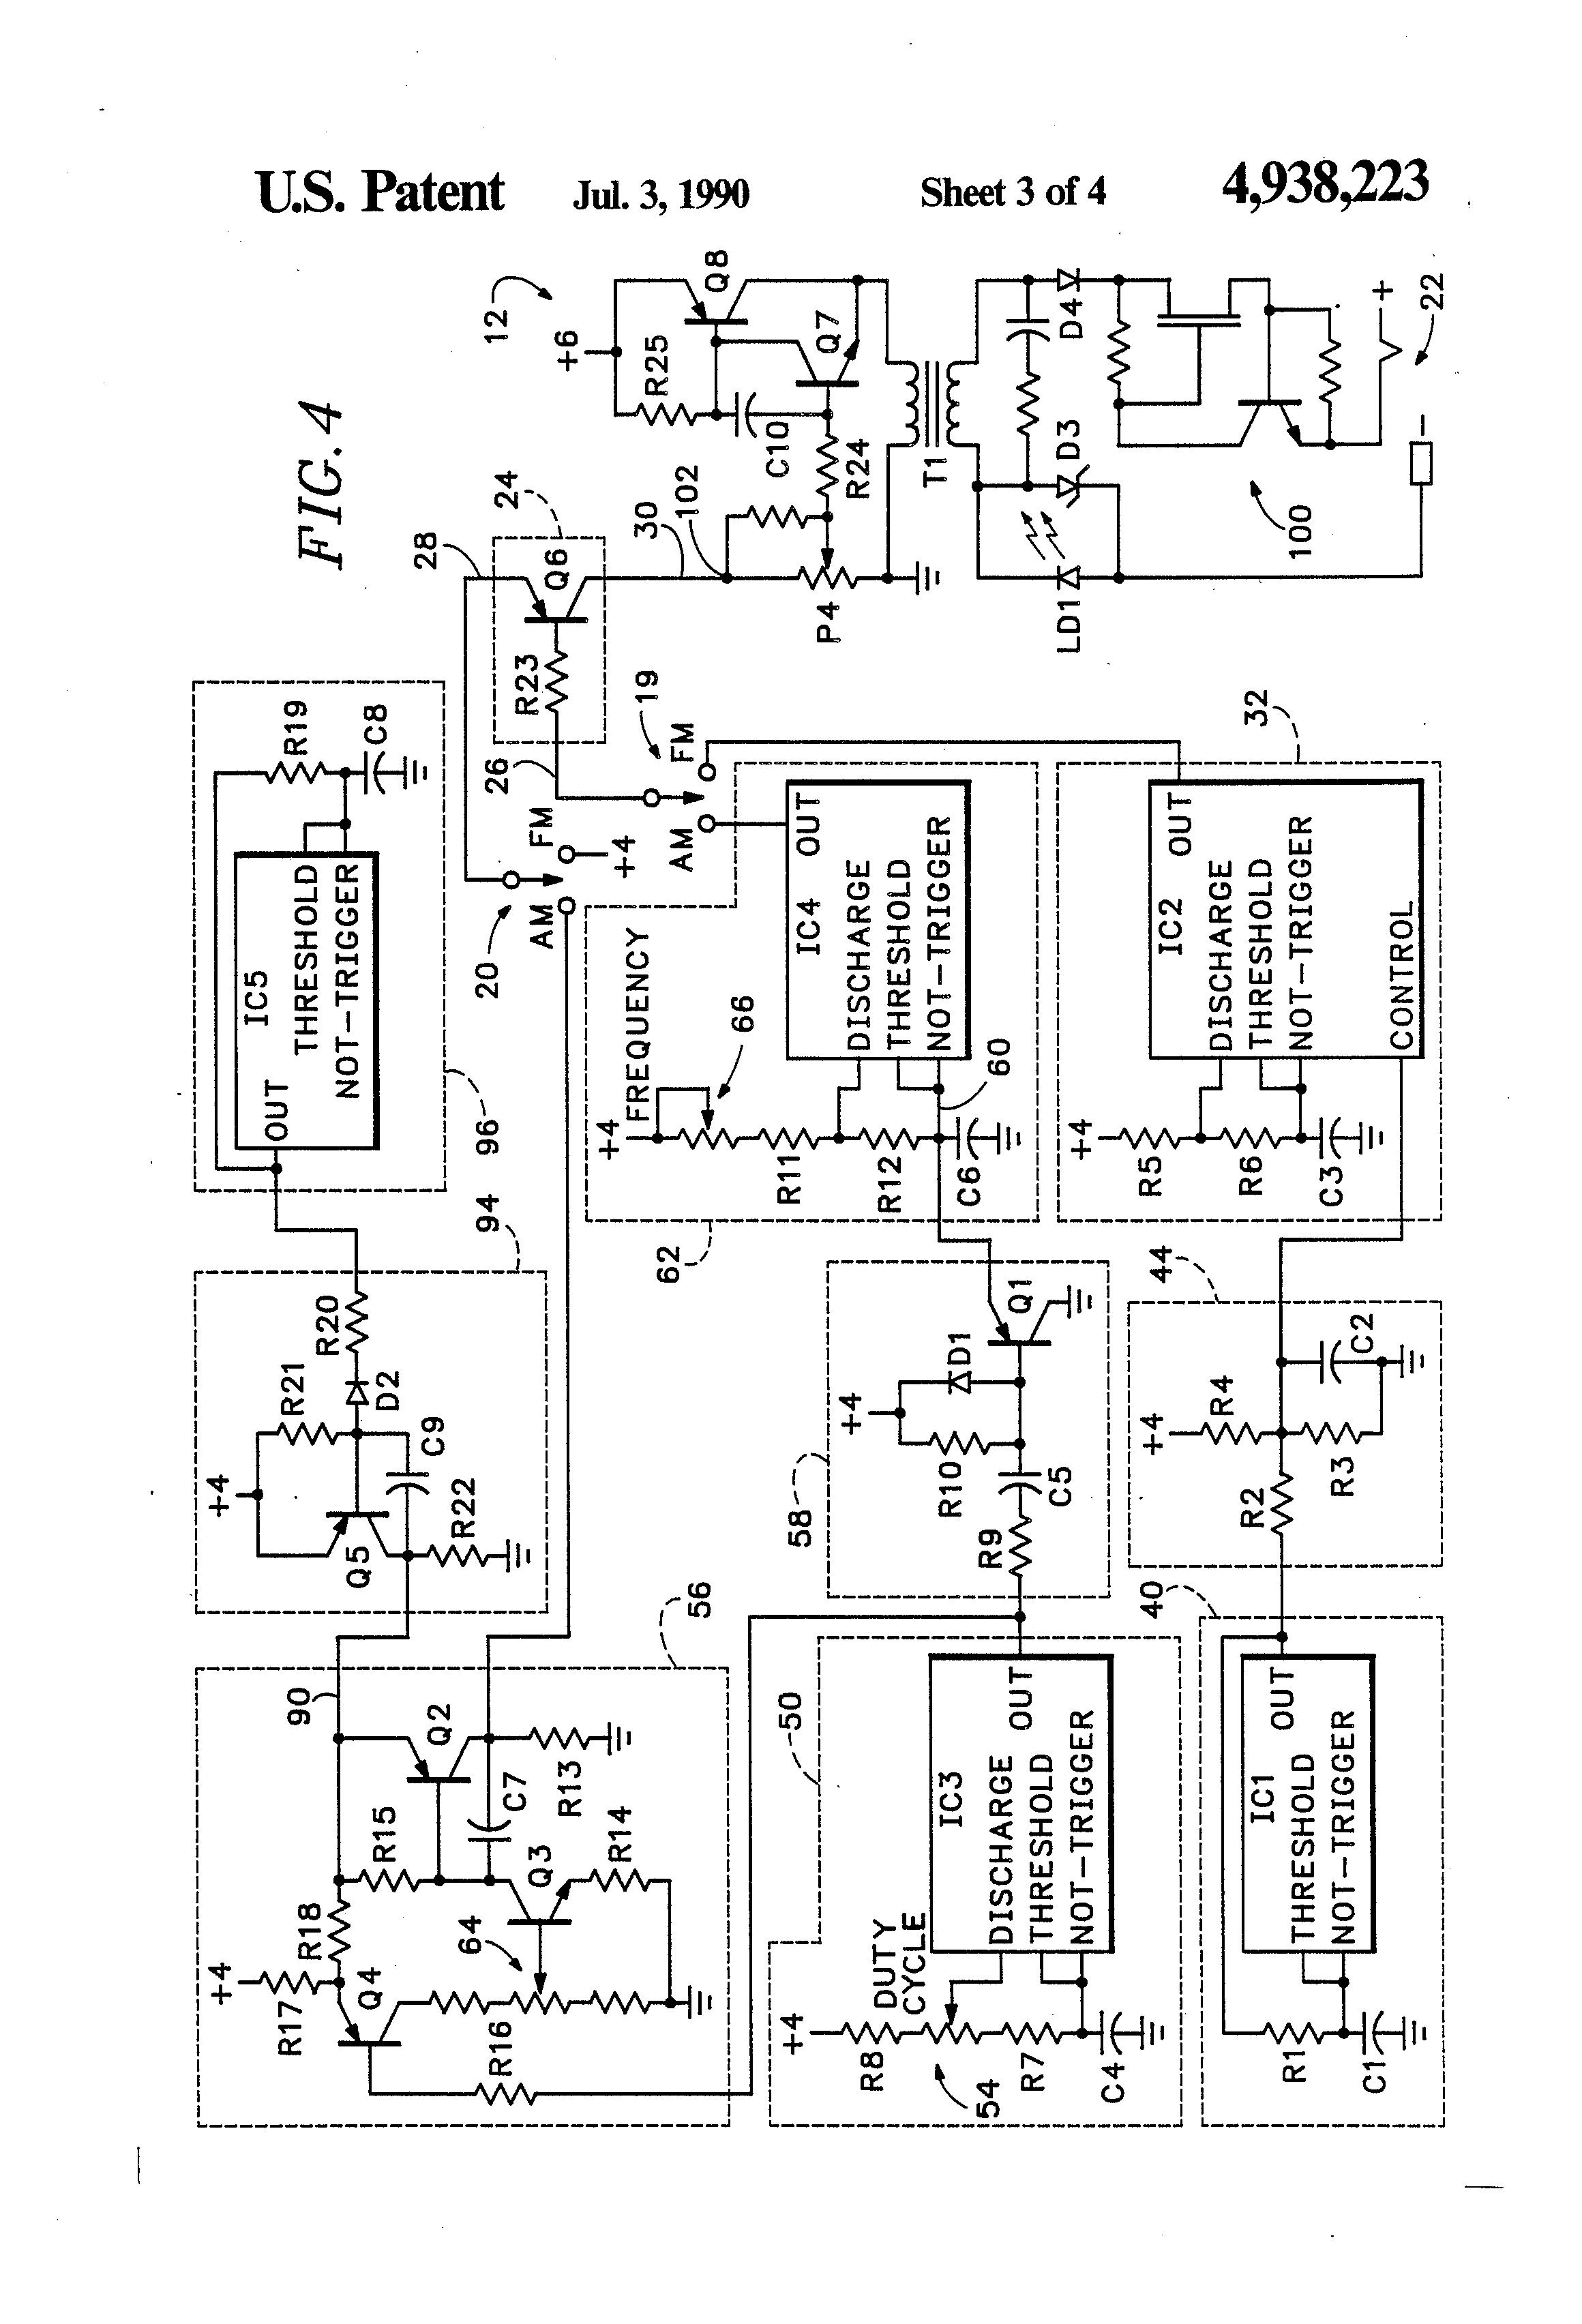 Excellent Tens Unit Circuit Diagram Auto Electrical Wiring Diagram Wiring Digital Resources Funapmognl